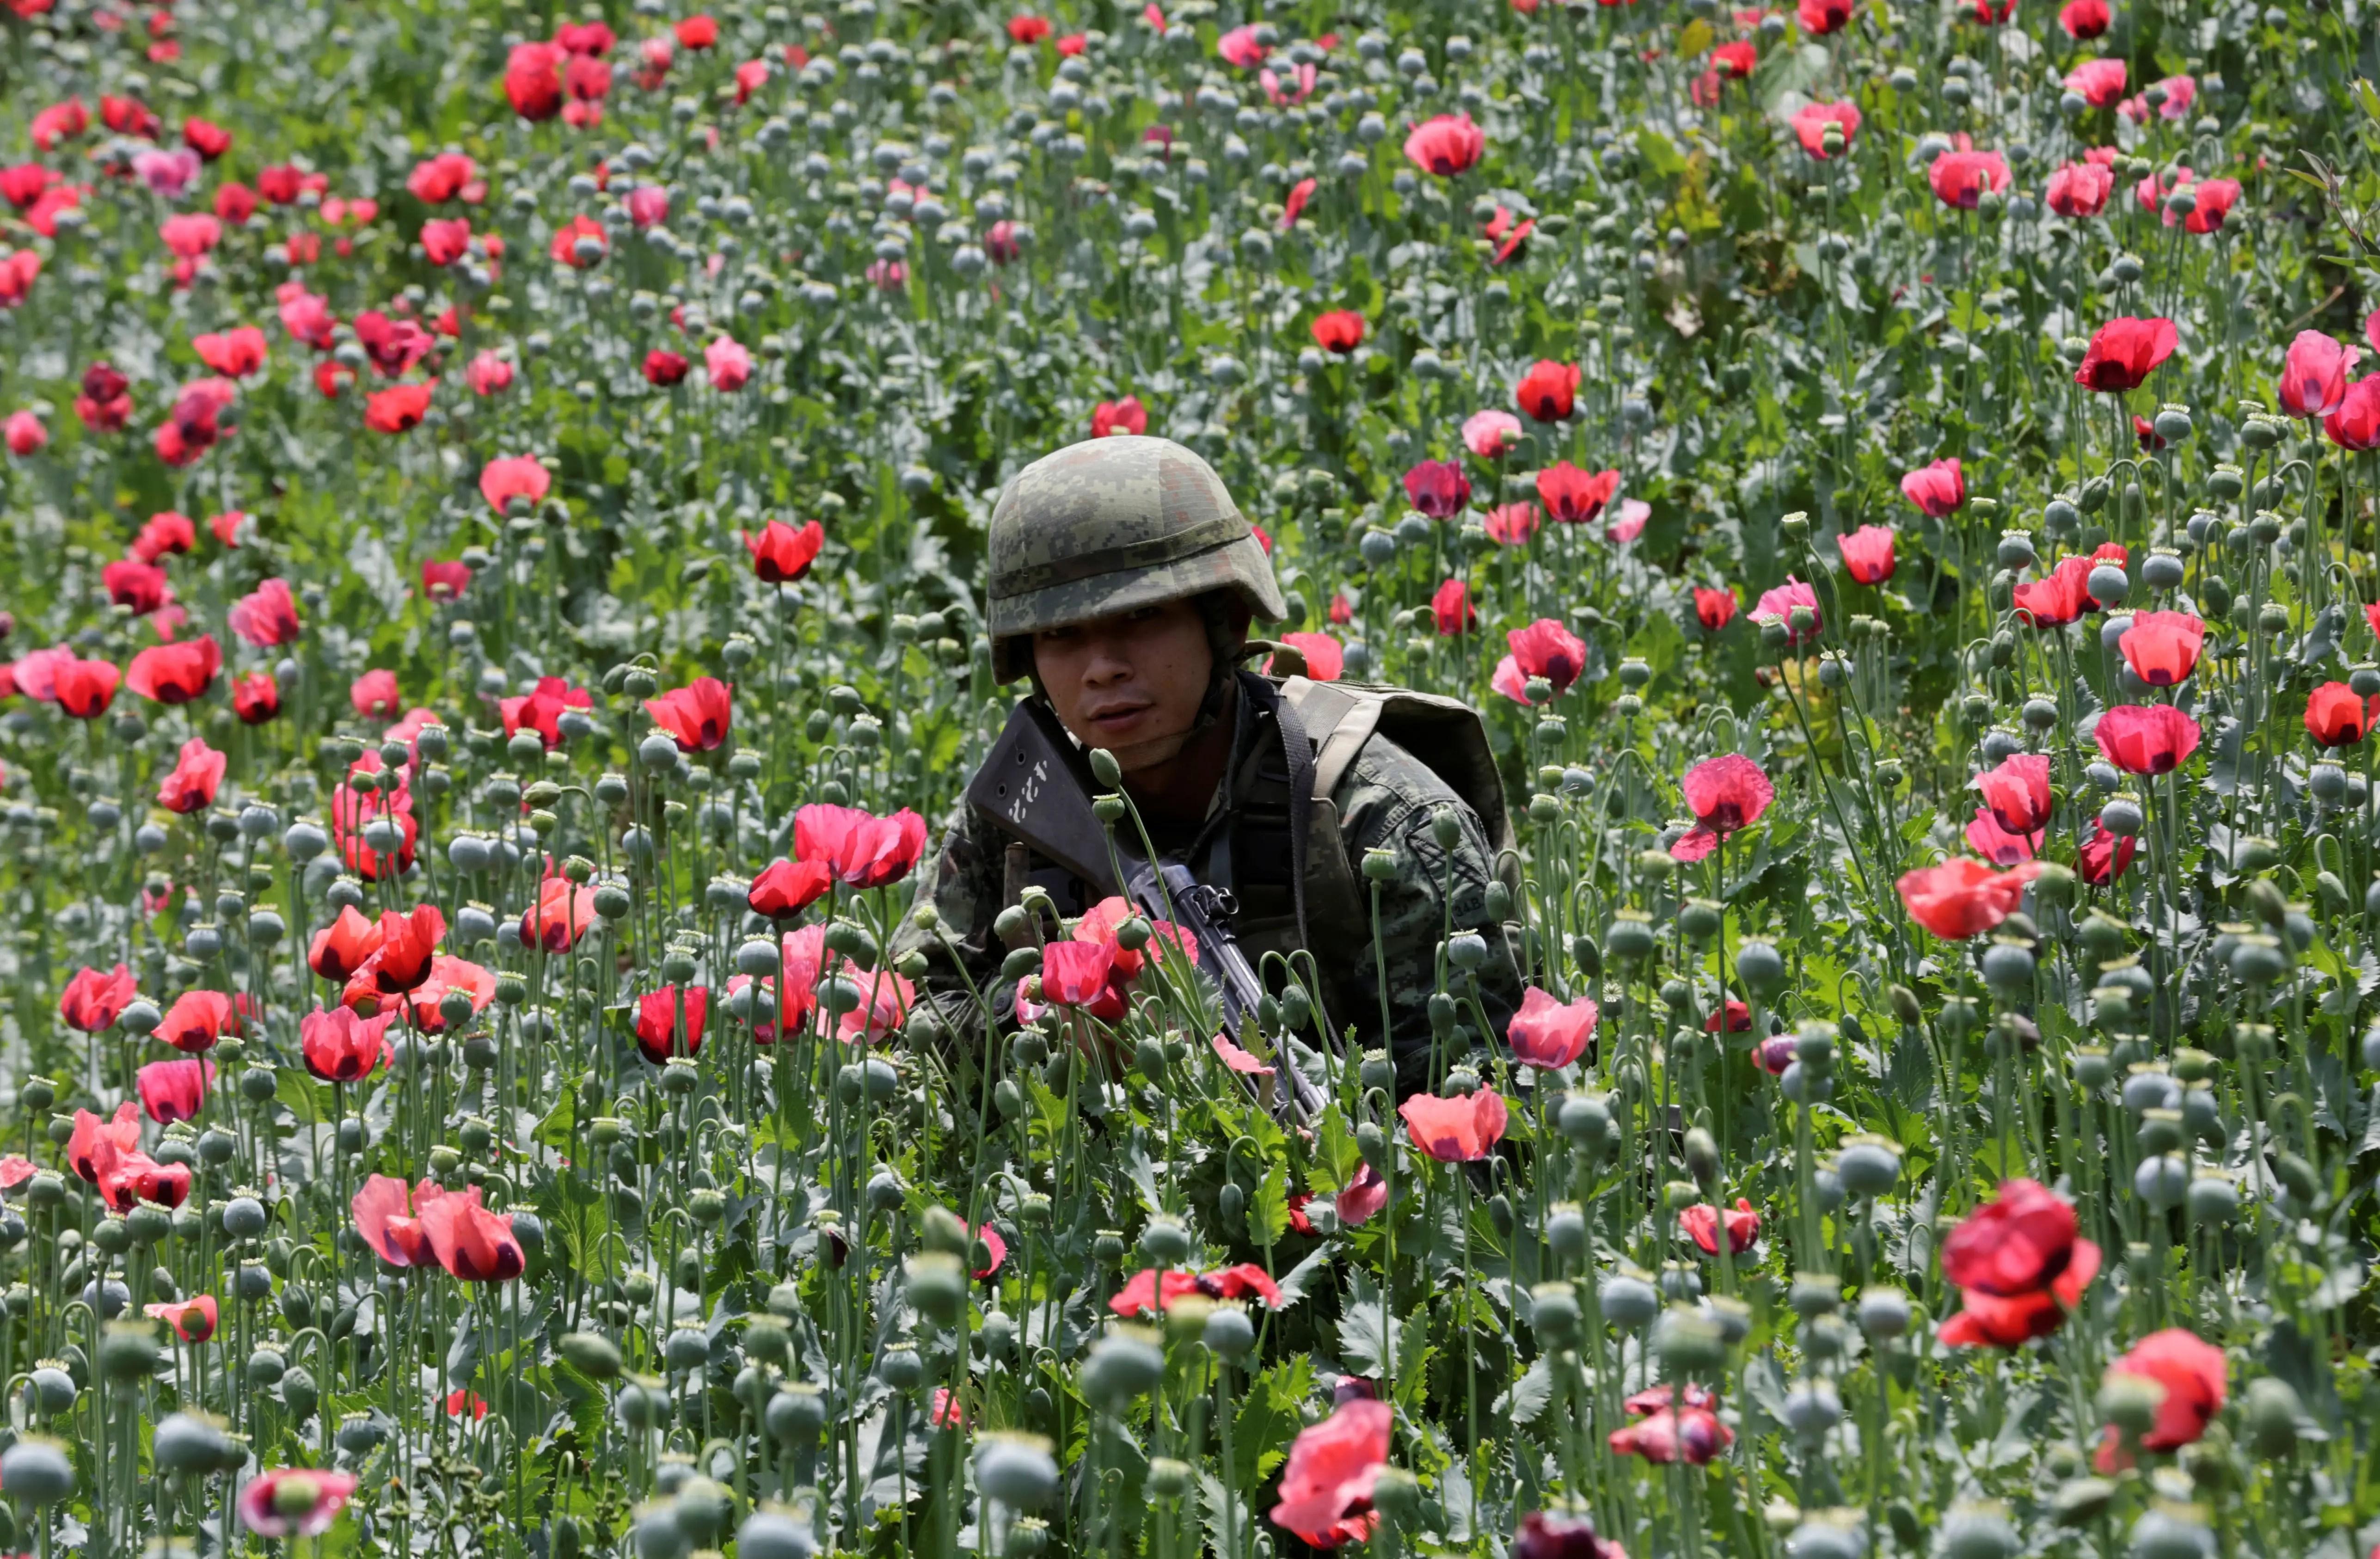 Mexico opium poppy field soldier troops